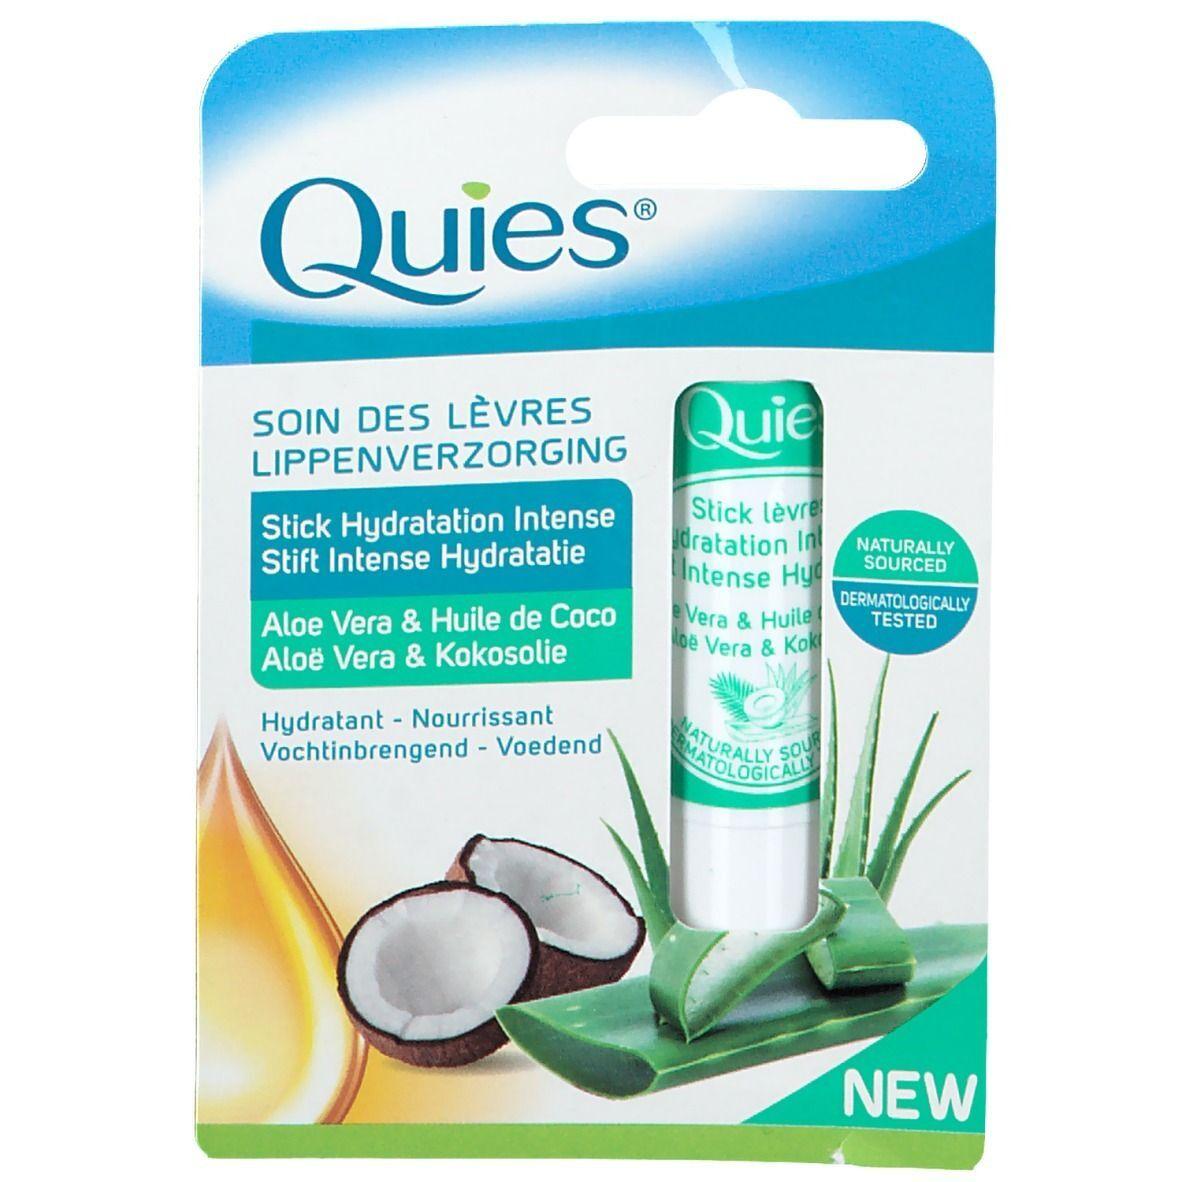 Quies® Stick Lèvres Hydratation Intense - Aloe-Vera & Huile de Coco g stylo(s)